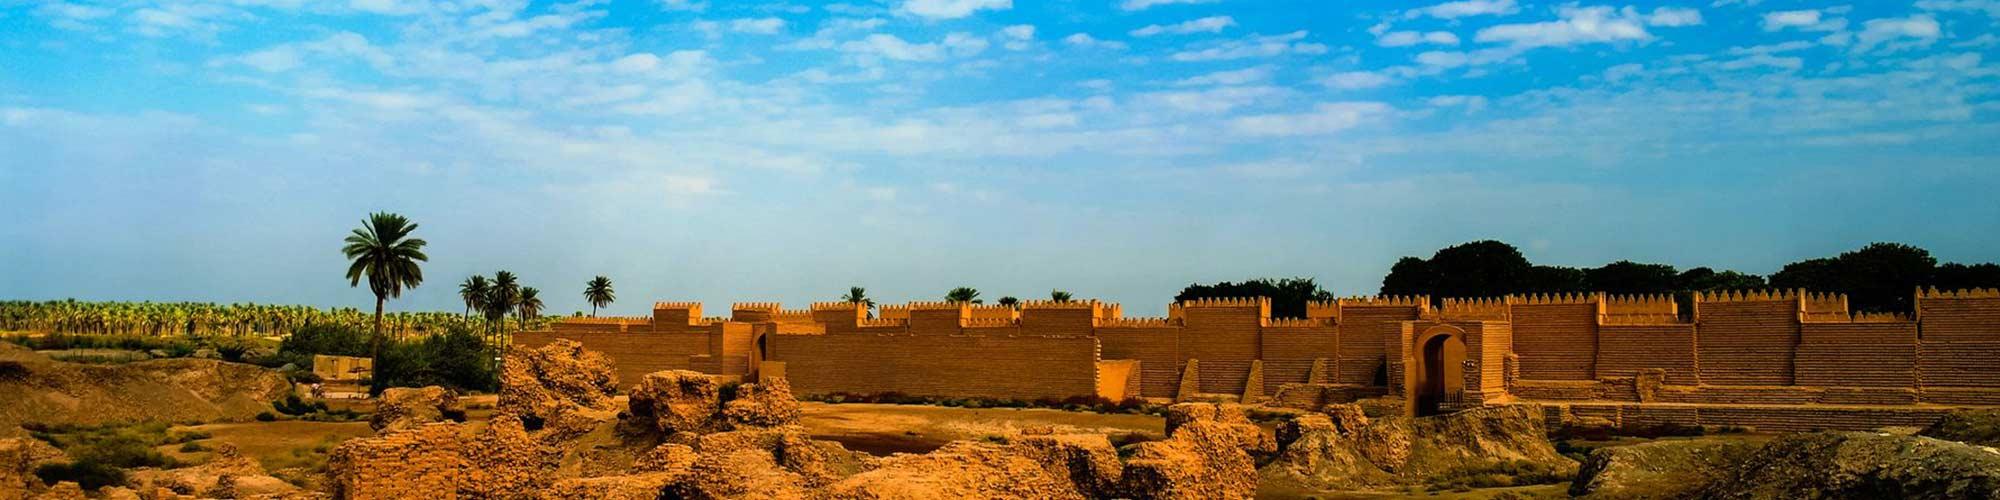 Mesopotamia: Ruinas Babilonia - El Pais Viajes